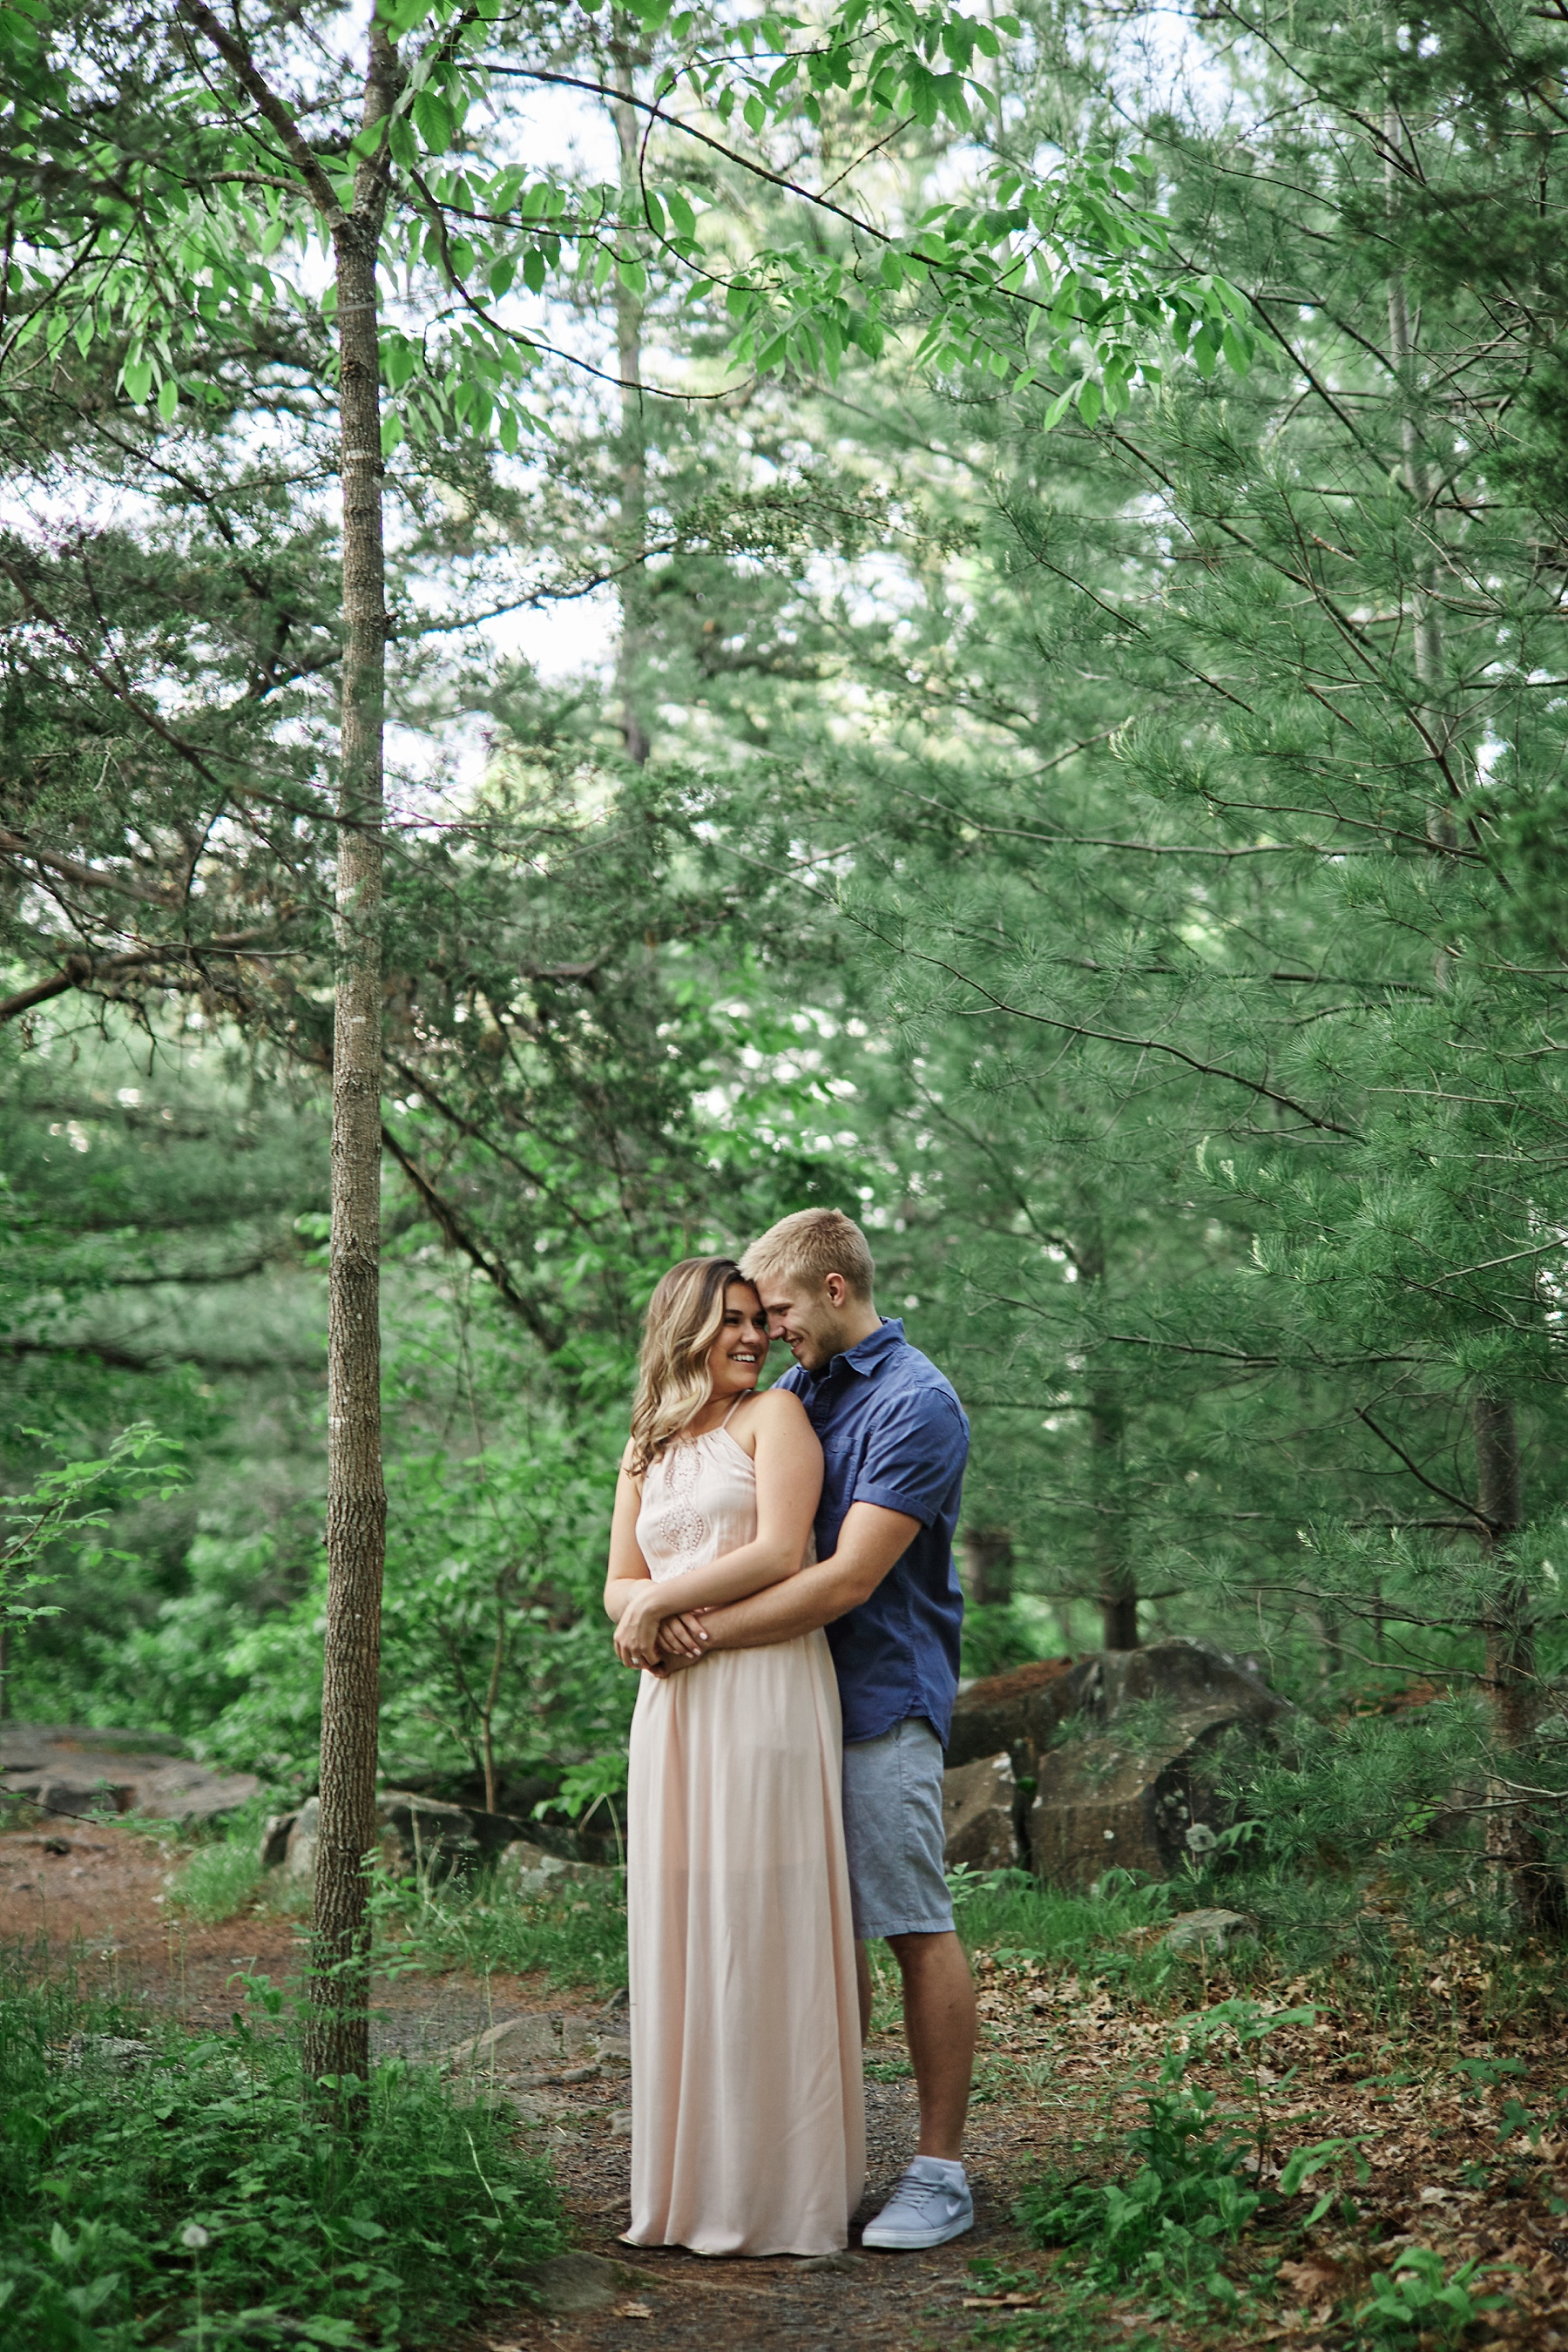 Destination-Engagement-Taylors-Falls-Minnesota-Minneapolis-Mayowood-Stone-Barn_0062.jpg